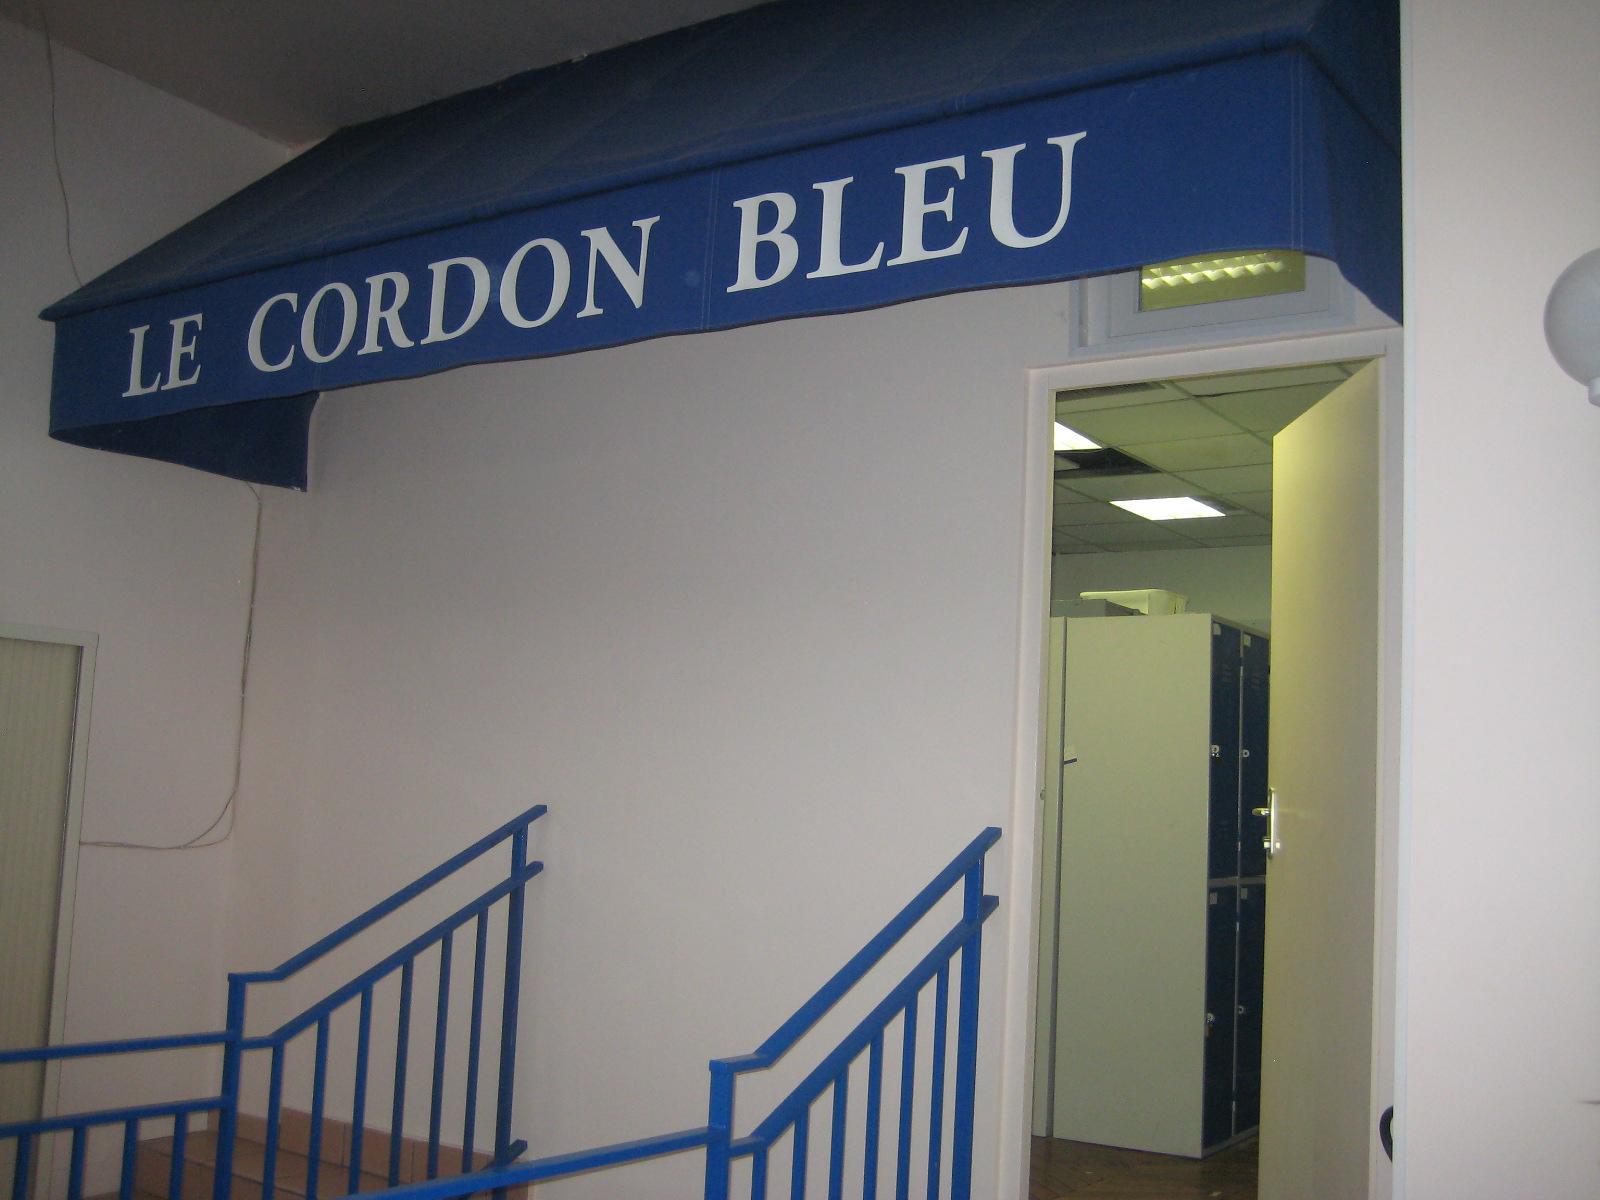 le cordon bleu paris times le cordon bleu superior. Black Bedroom Furniture Sets. Home Design Ideas